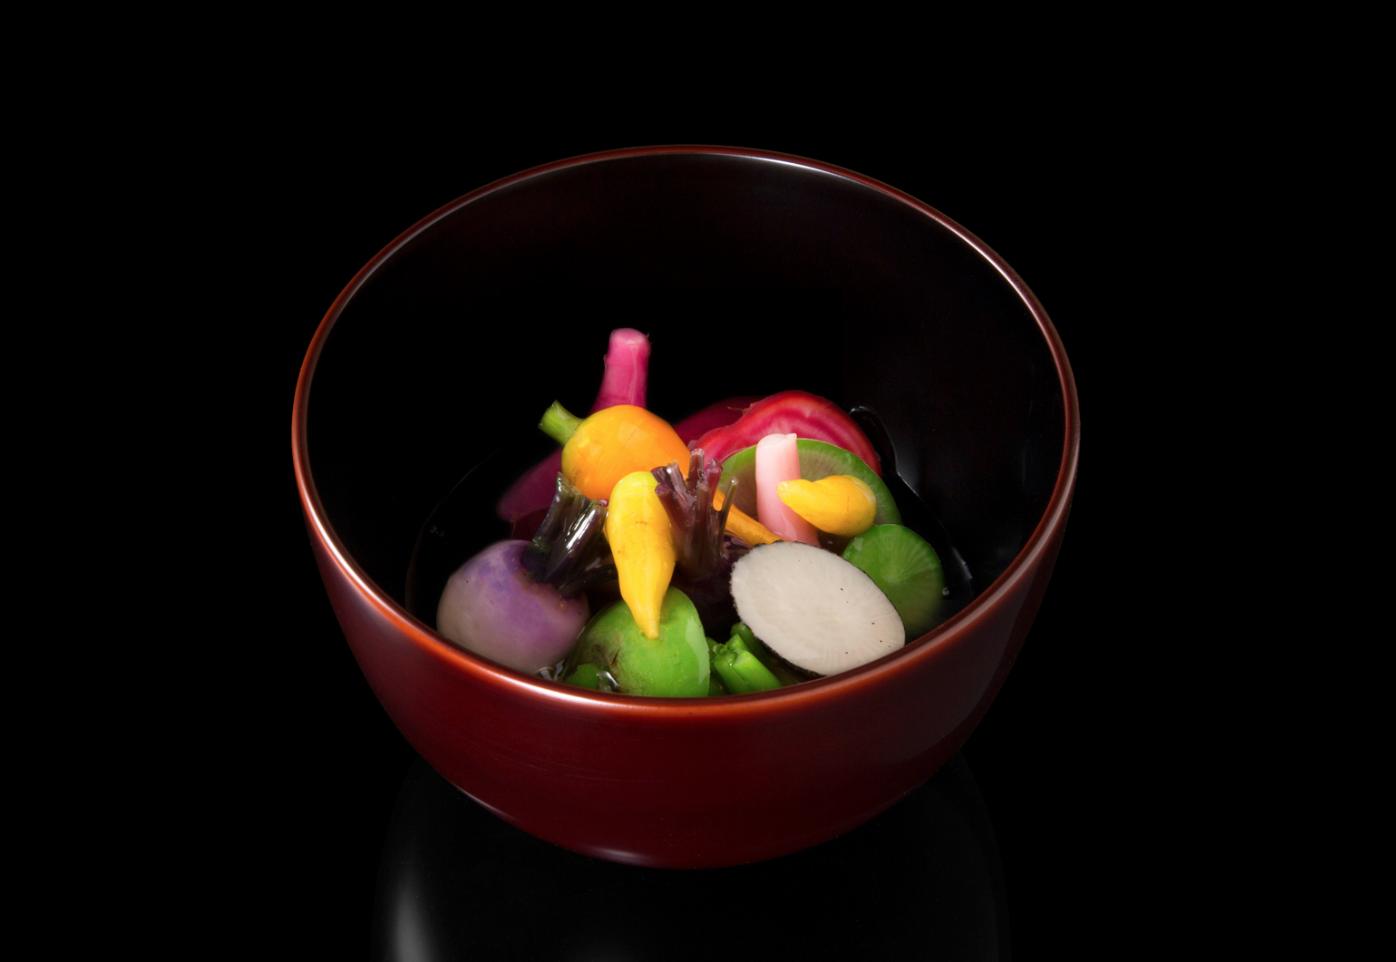 japonés, foodies, lifestyle, Madrid Fusión, chefs, Zaiyu Hasegawa